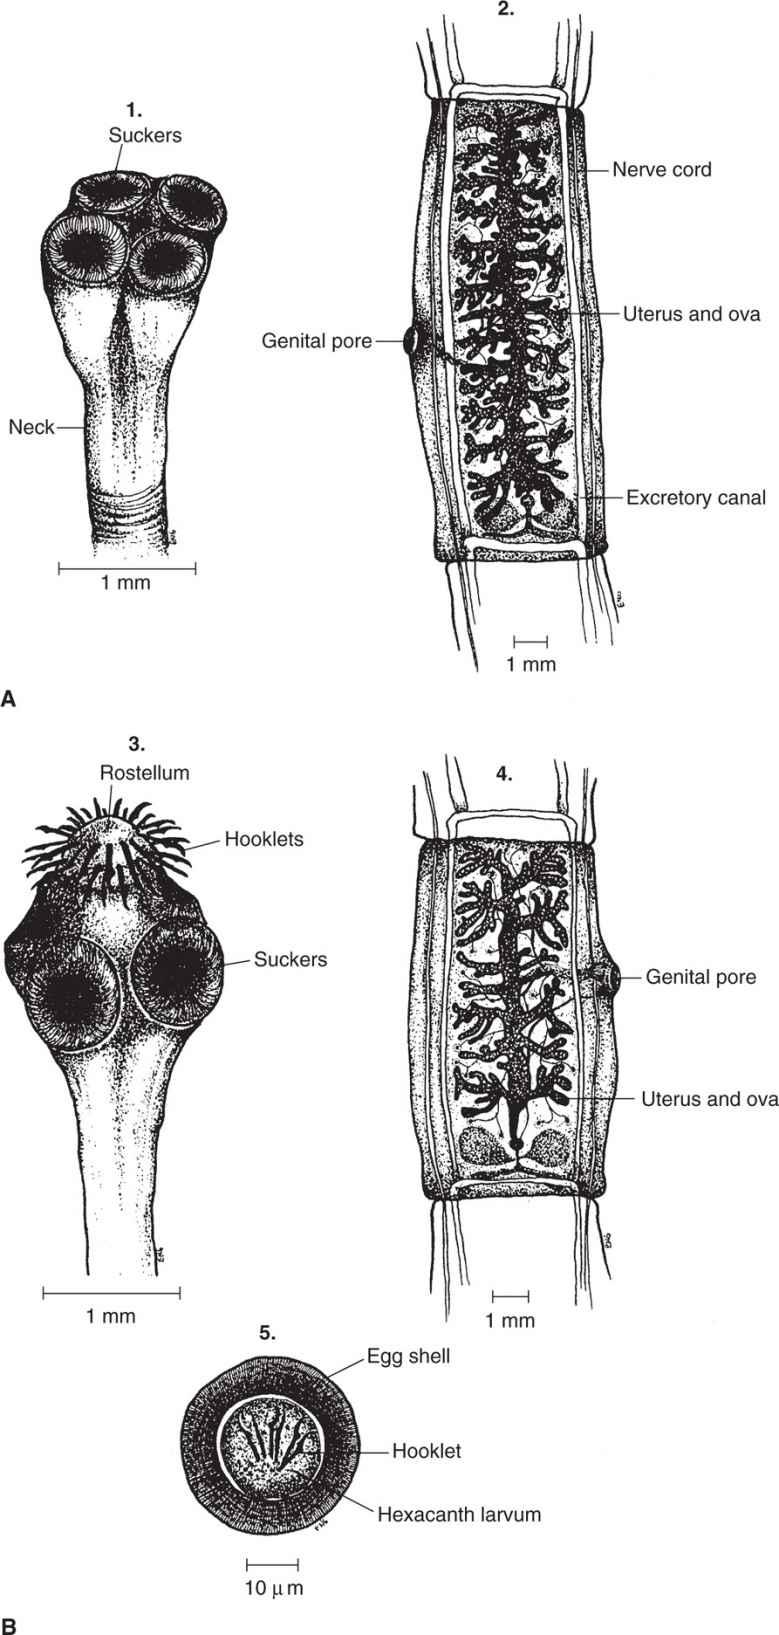 56 cestodes basicmedical key tapeworm structures a taenia saginata b taenia solium 1 3 scolices 2 4 gravid proglottids 5 ova indistinguishable between species pooptronica